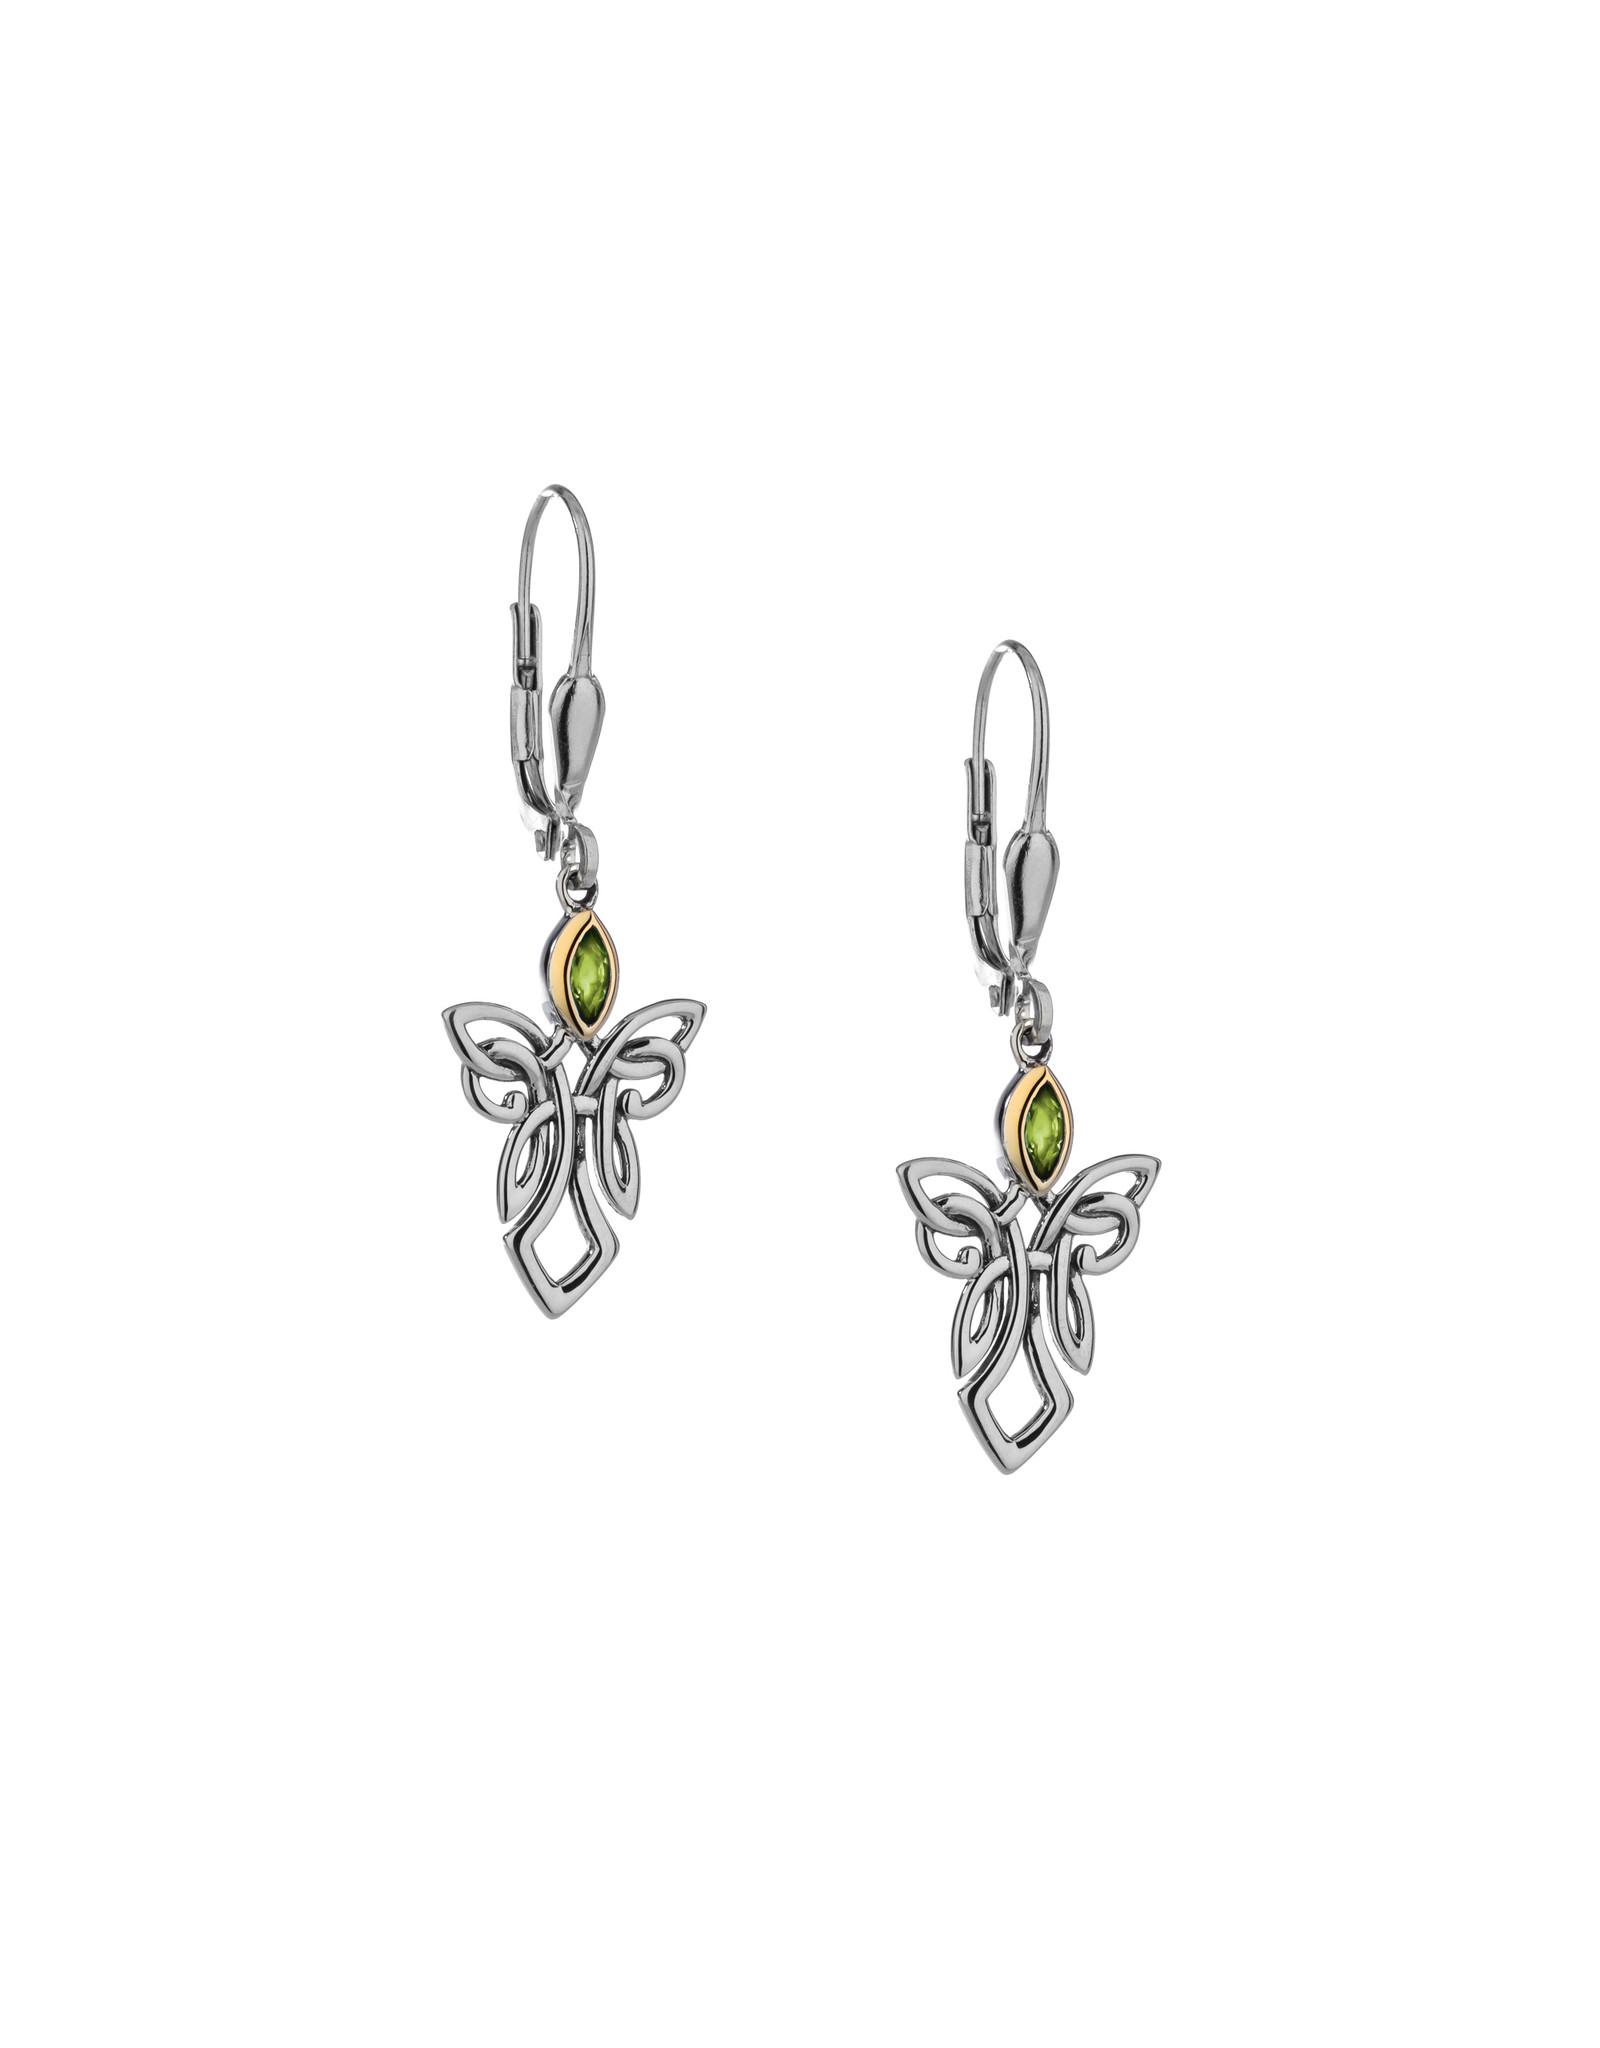 Keith Jack Silver + 10k Guardian Angel Earrings by Keith Jack